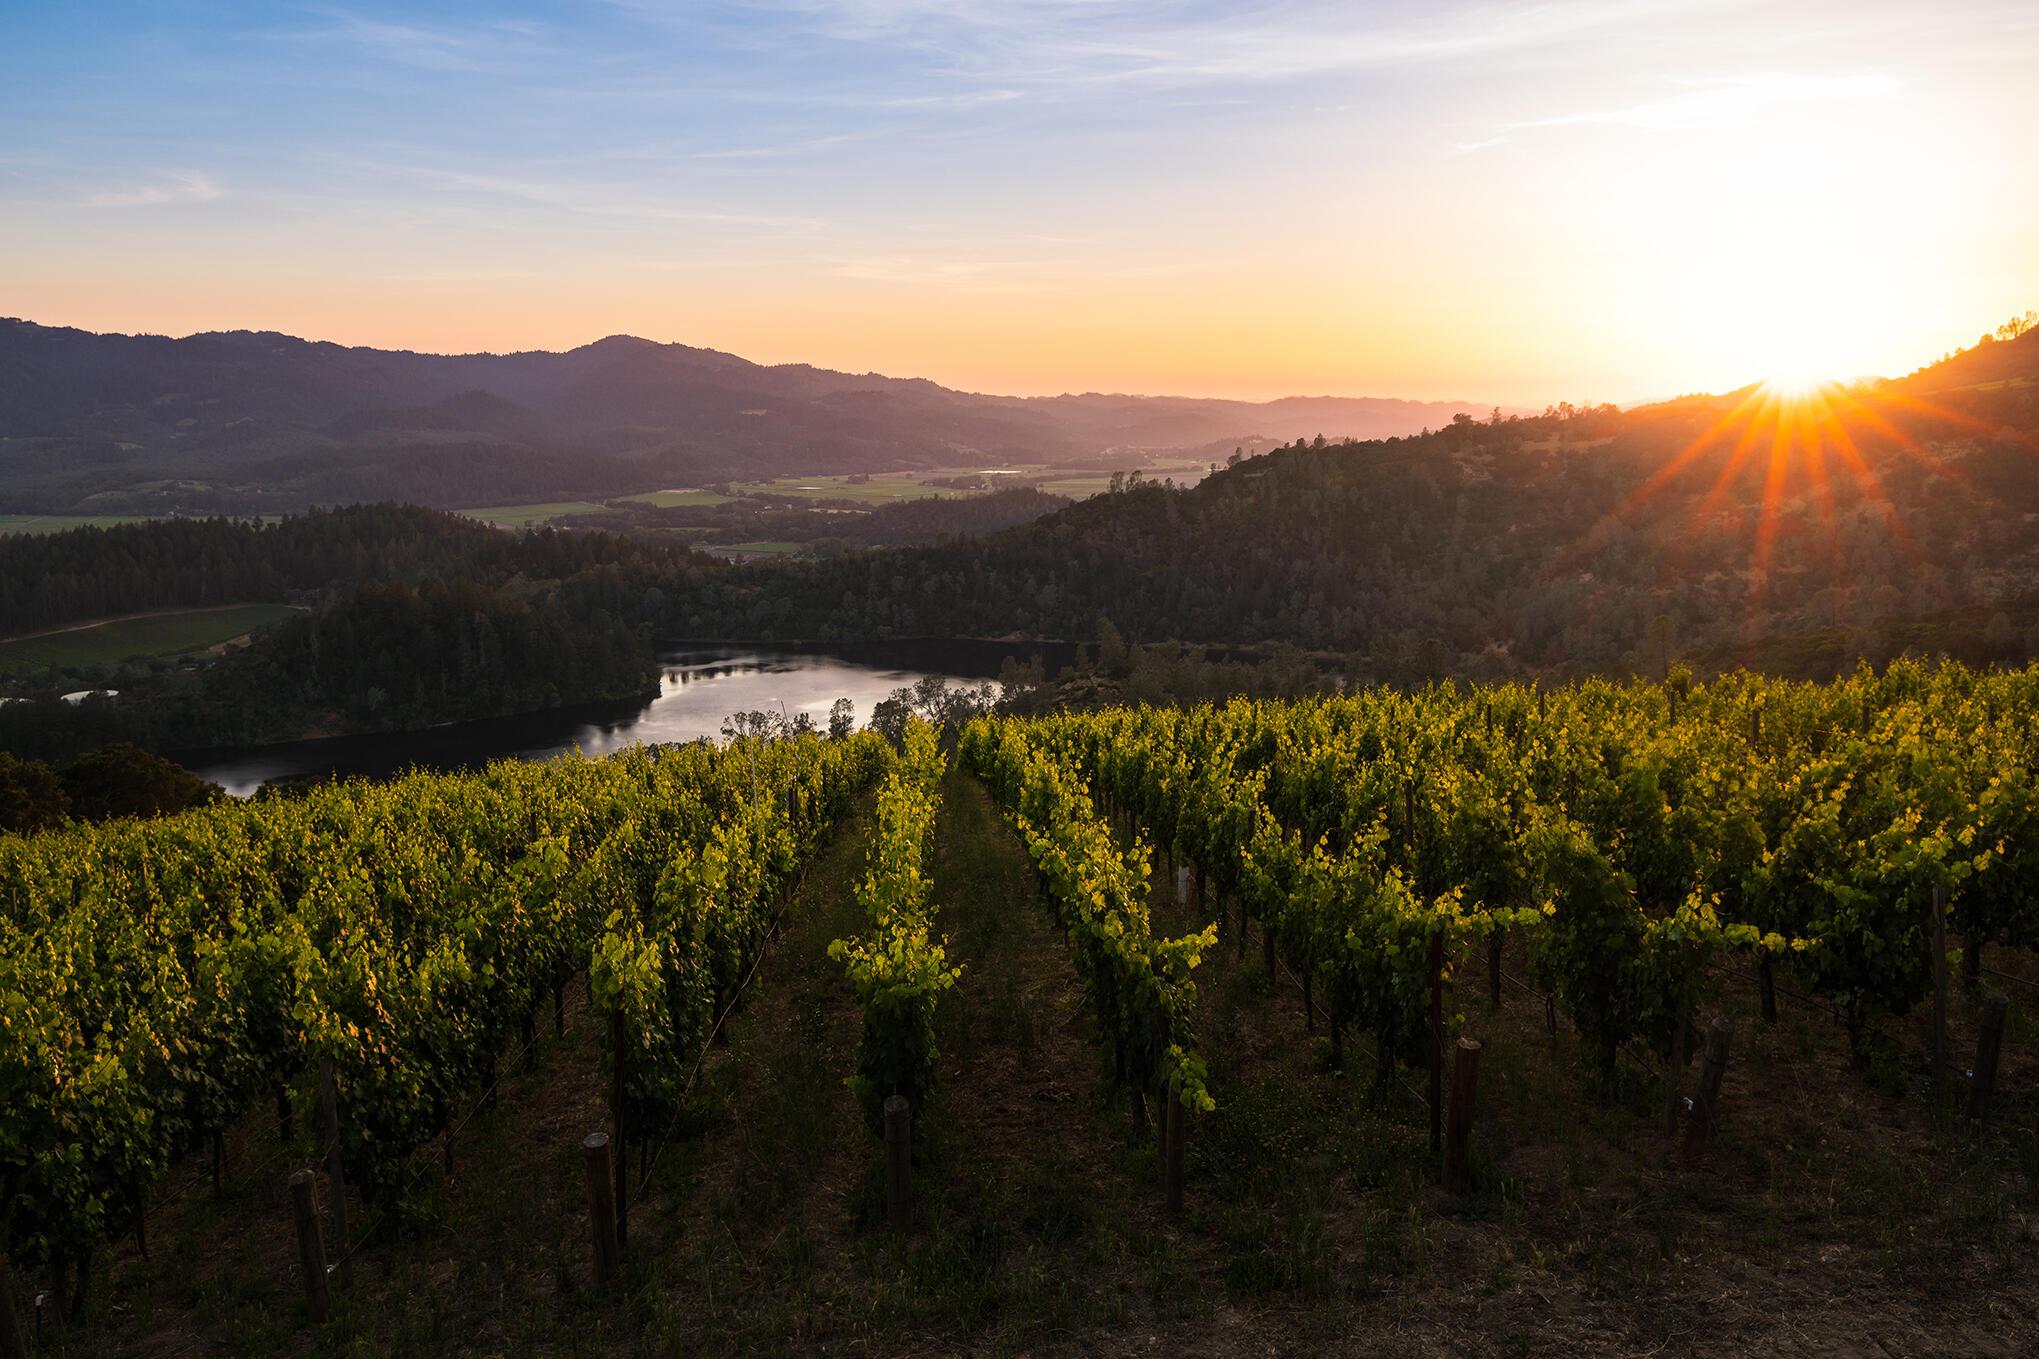 Viader Vineyards & Winery Cover Image